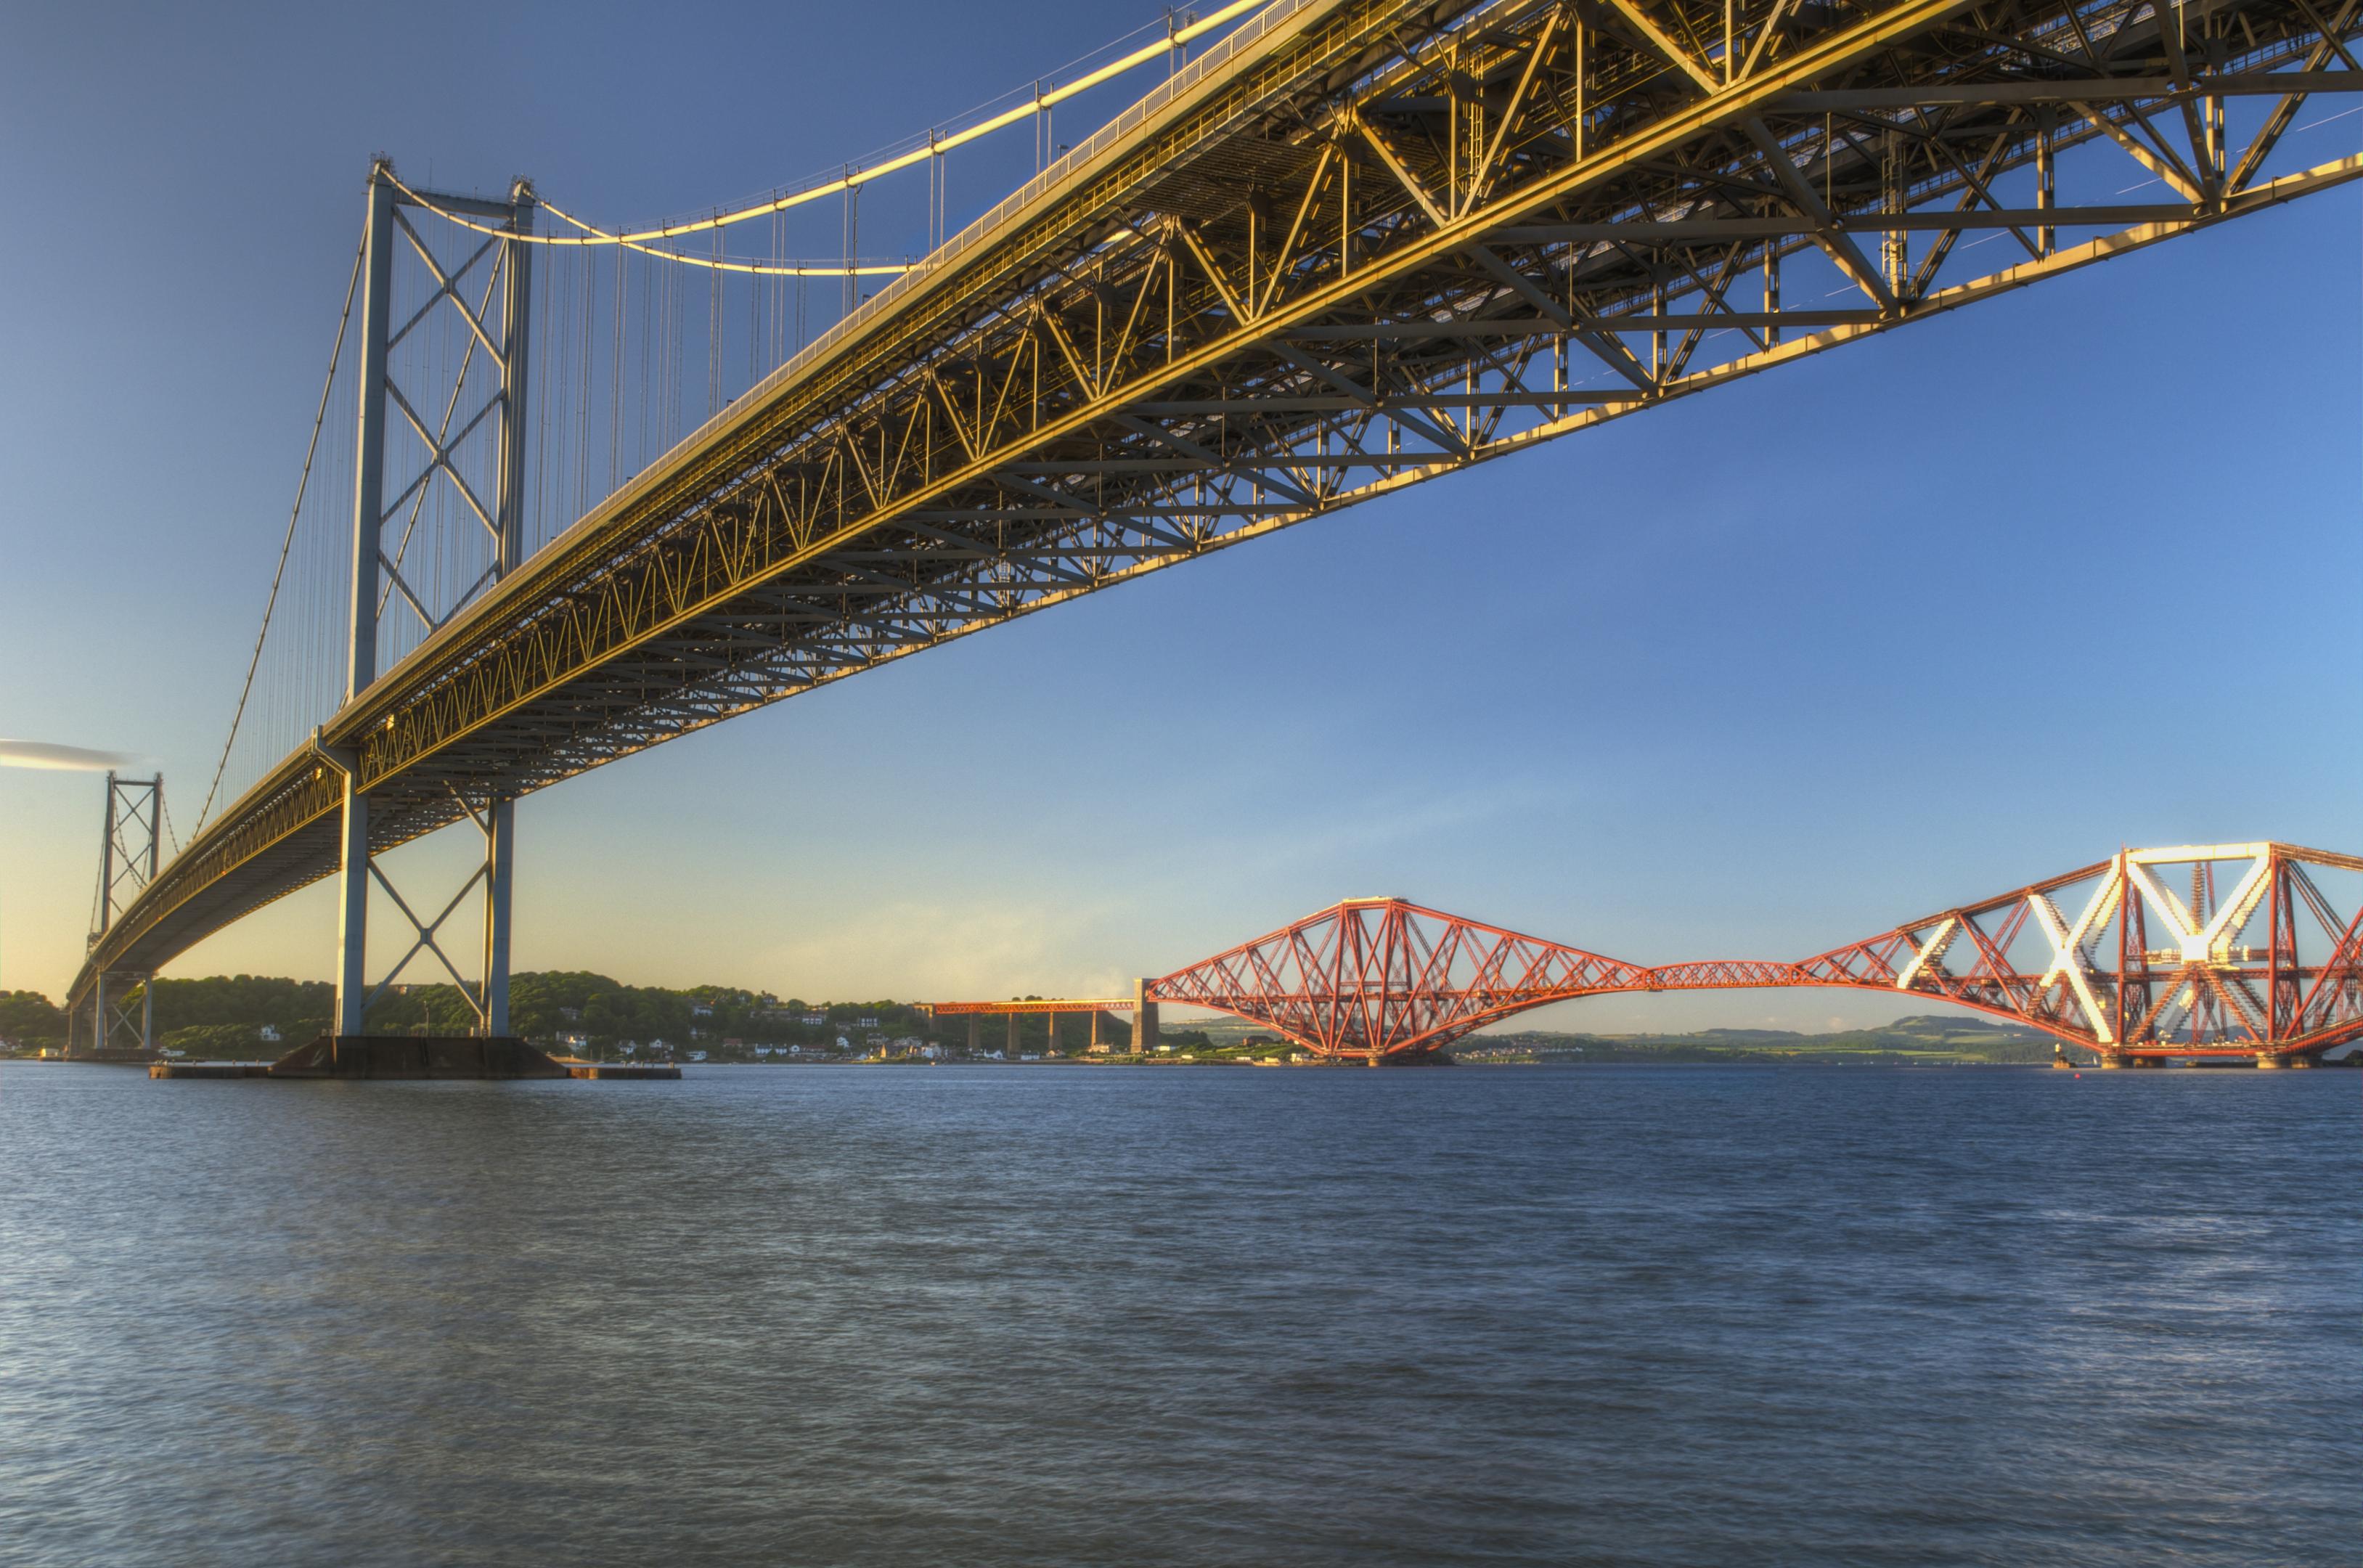 The Forth Road Bridge is one of the Scottish landmak